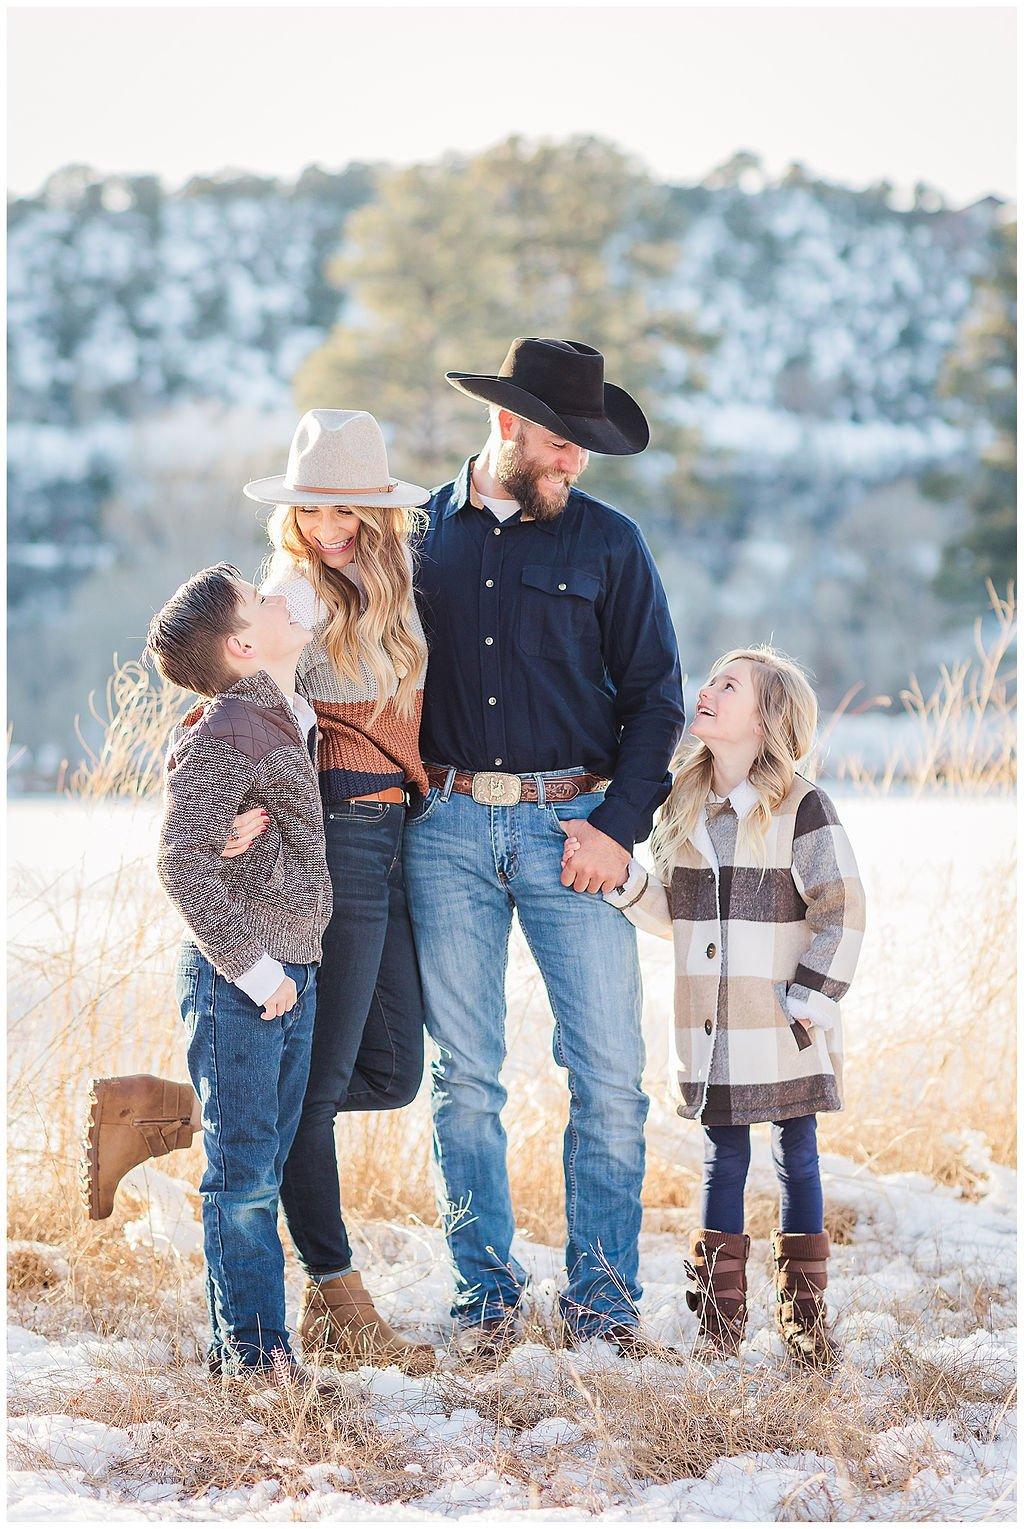 Winter Family Portrait